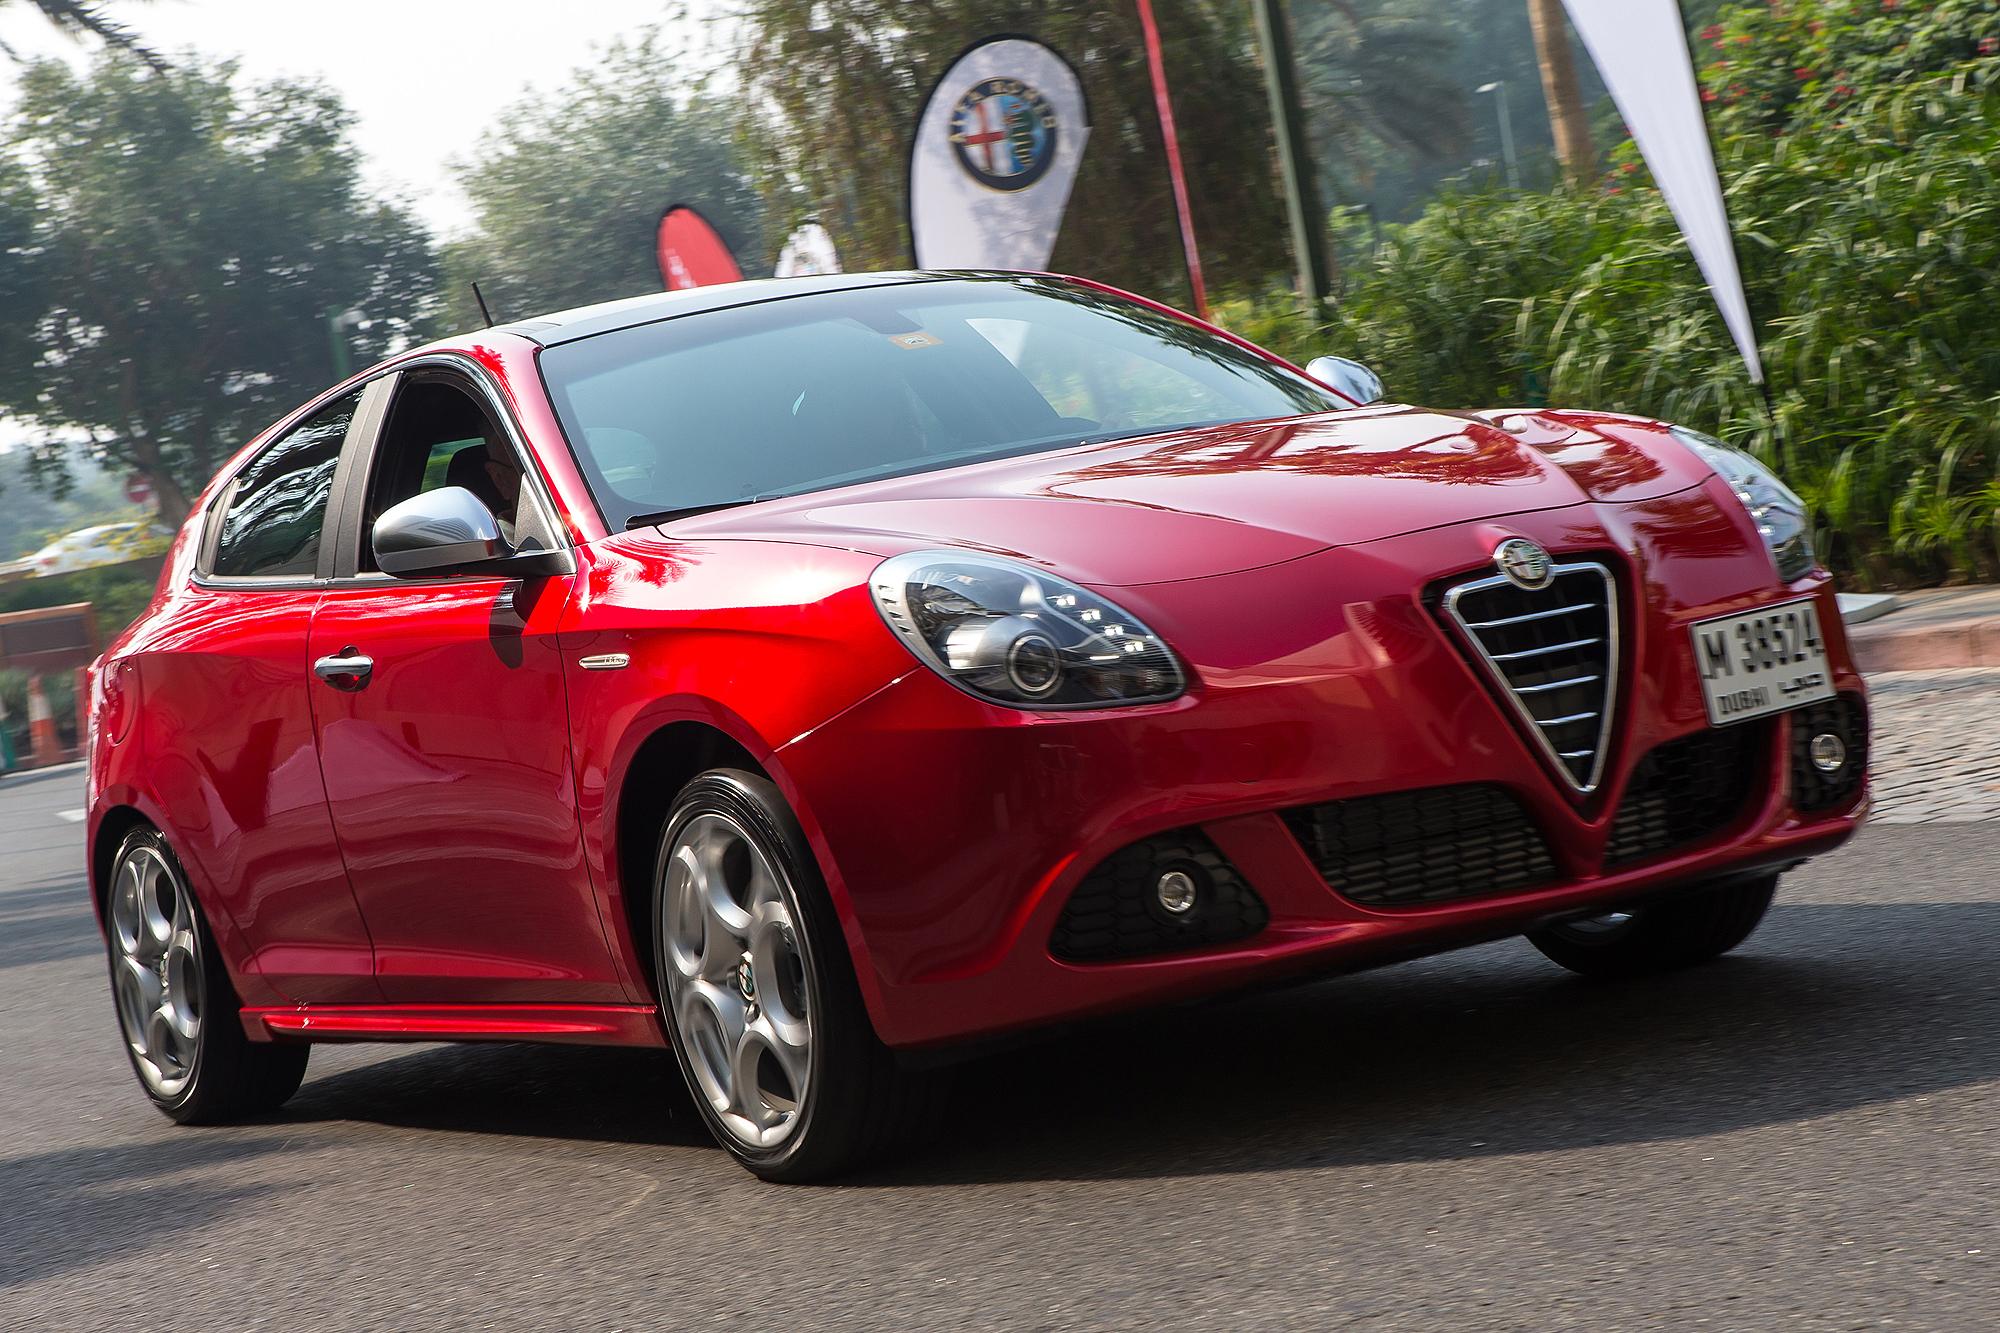 Alfa Romeo Giulietta Review - Motoring Middle East: Car news ... on giulietta and romeo, uggs on sale men's romeo, things that describe romeo, alpha romeo, ver videos de romeo, alpine romeo, marseille romeo,